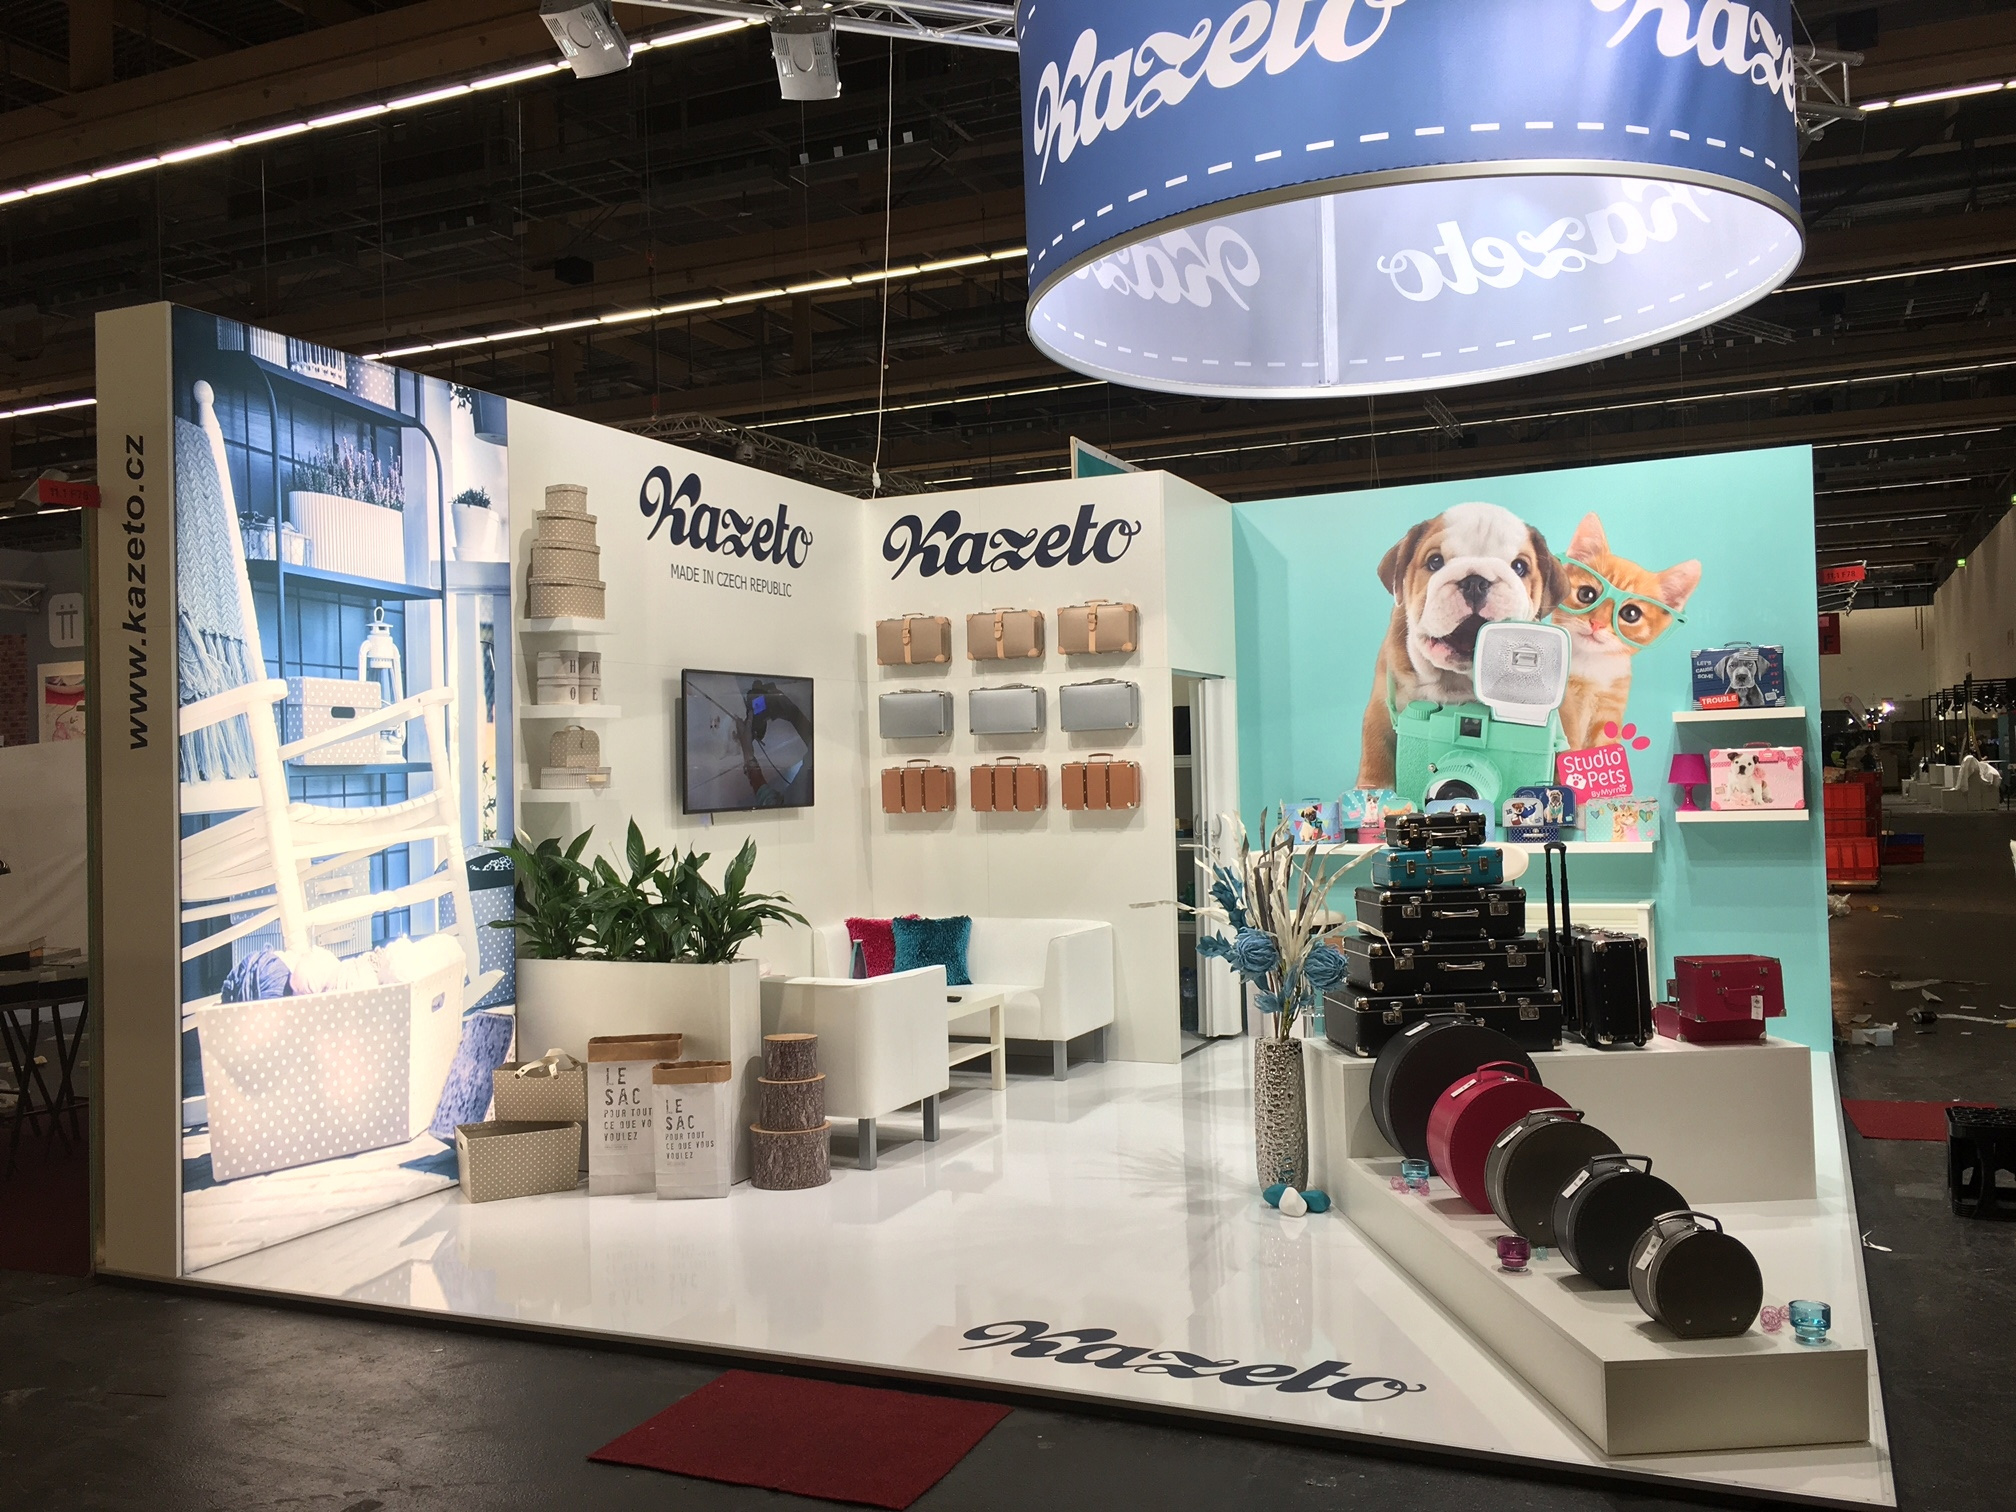 Kazeto on Ambiente - hall 11.1, stand F78, 12. – 16.2.2016, Frankfurt am Main